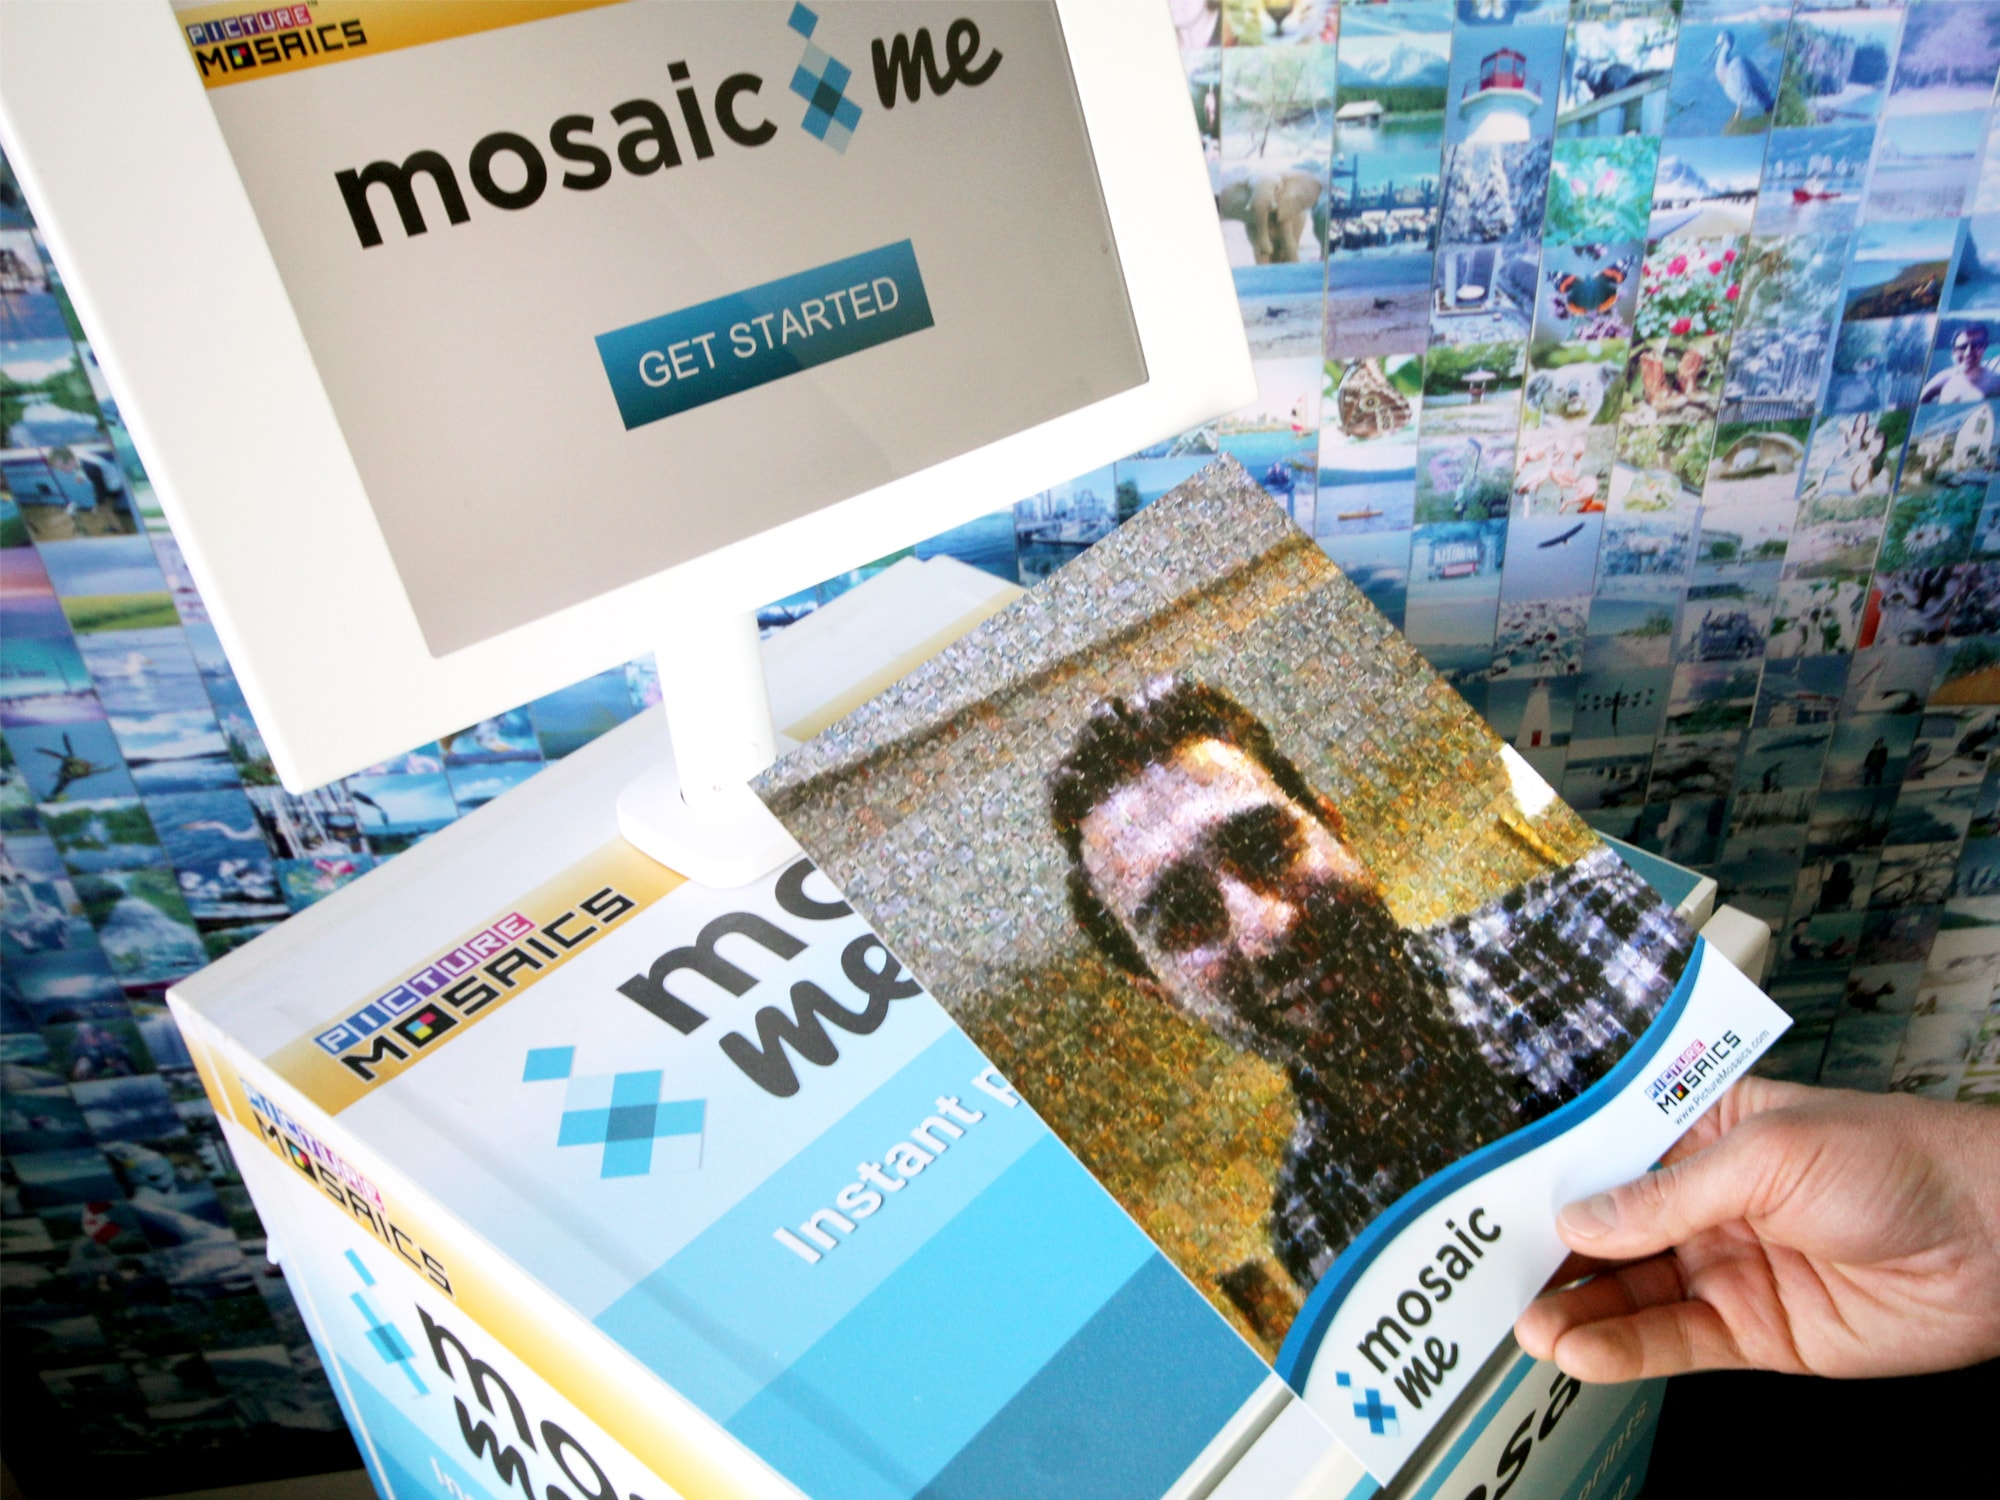 BizBash Live Print Mosaic Event